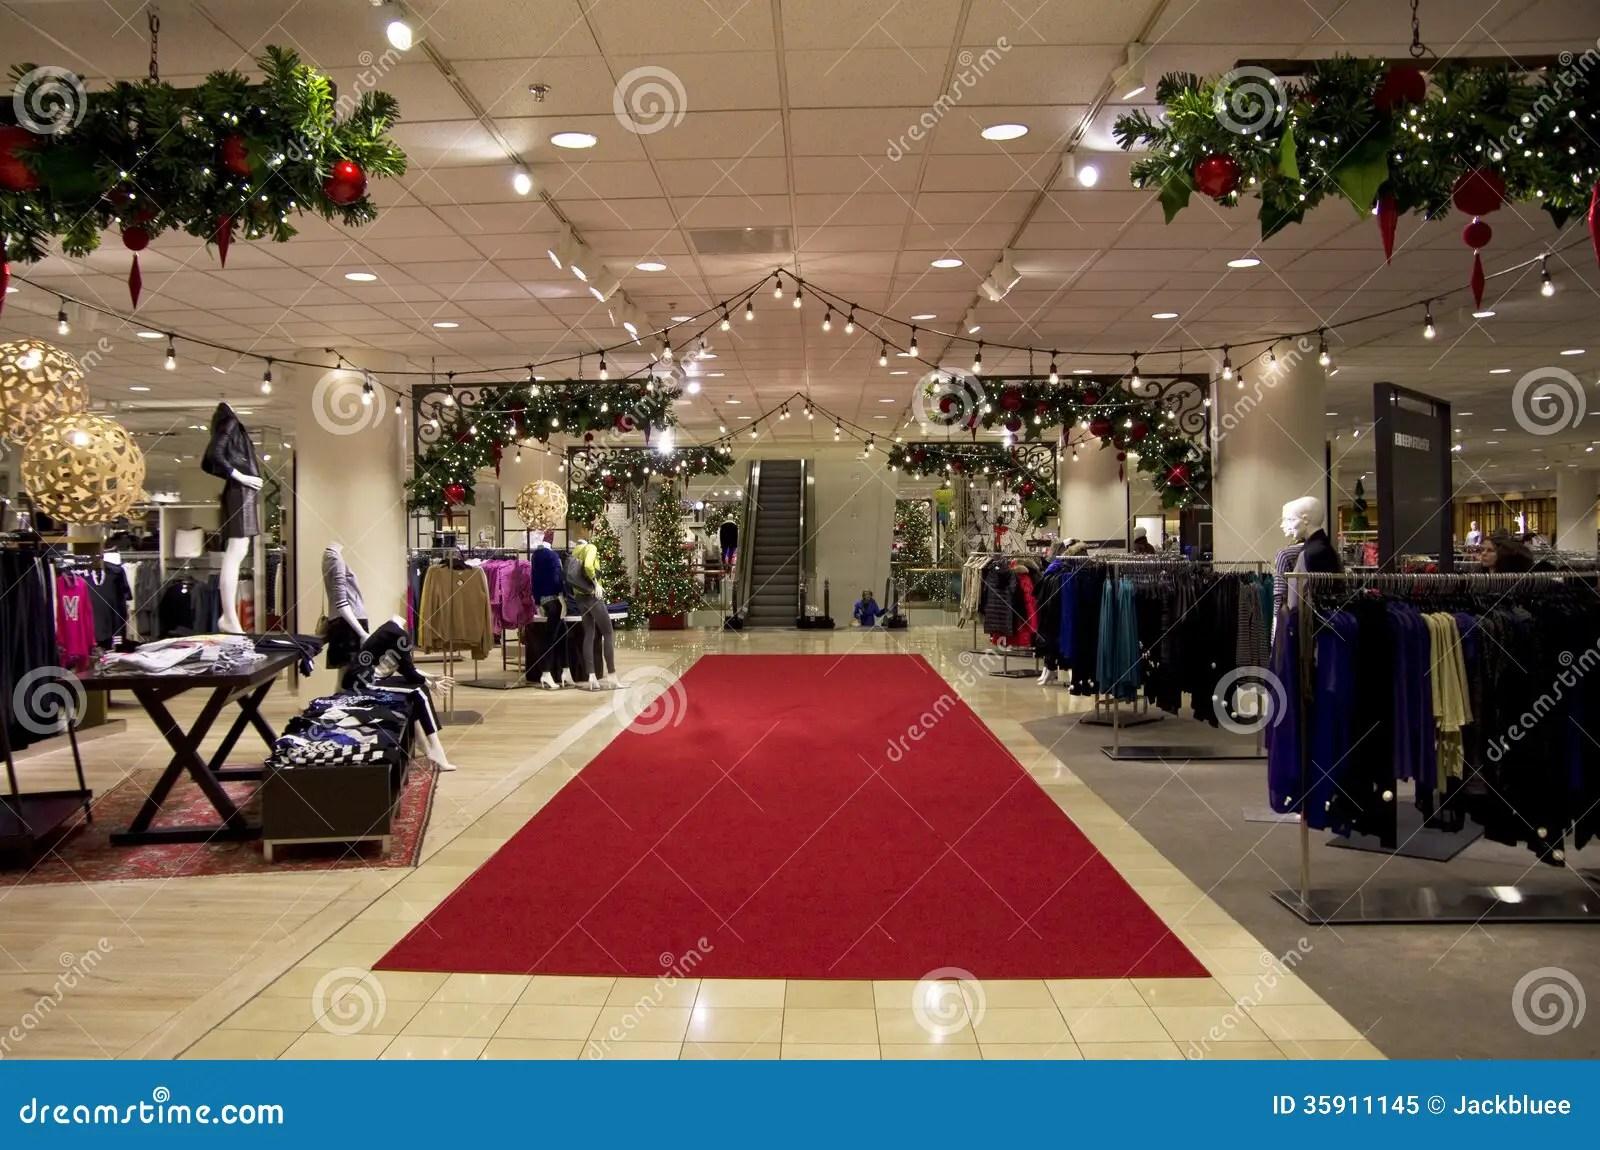 Department Store Mall Shopping Christmas Tree Ligh